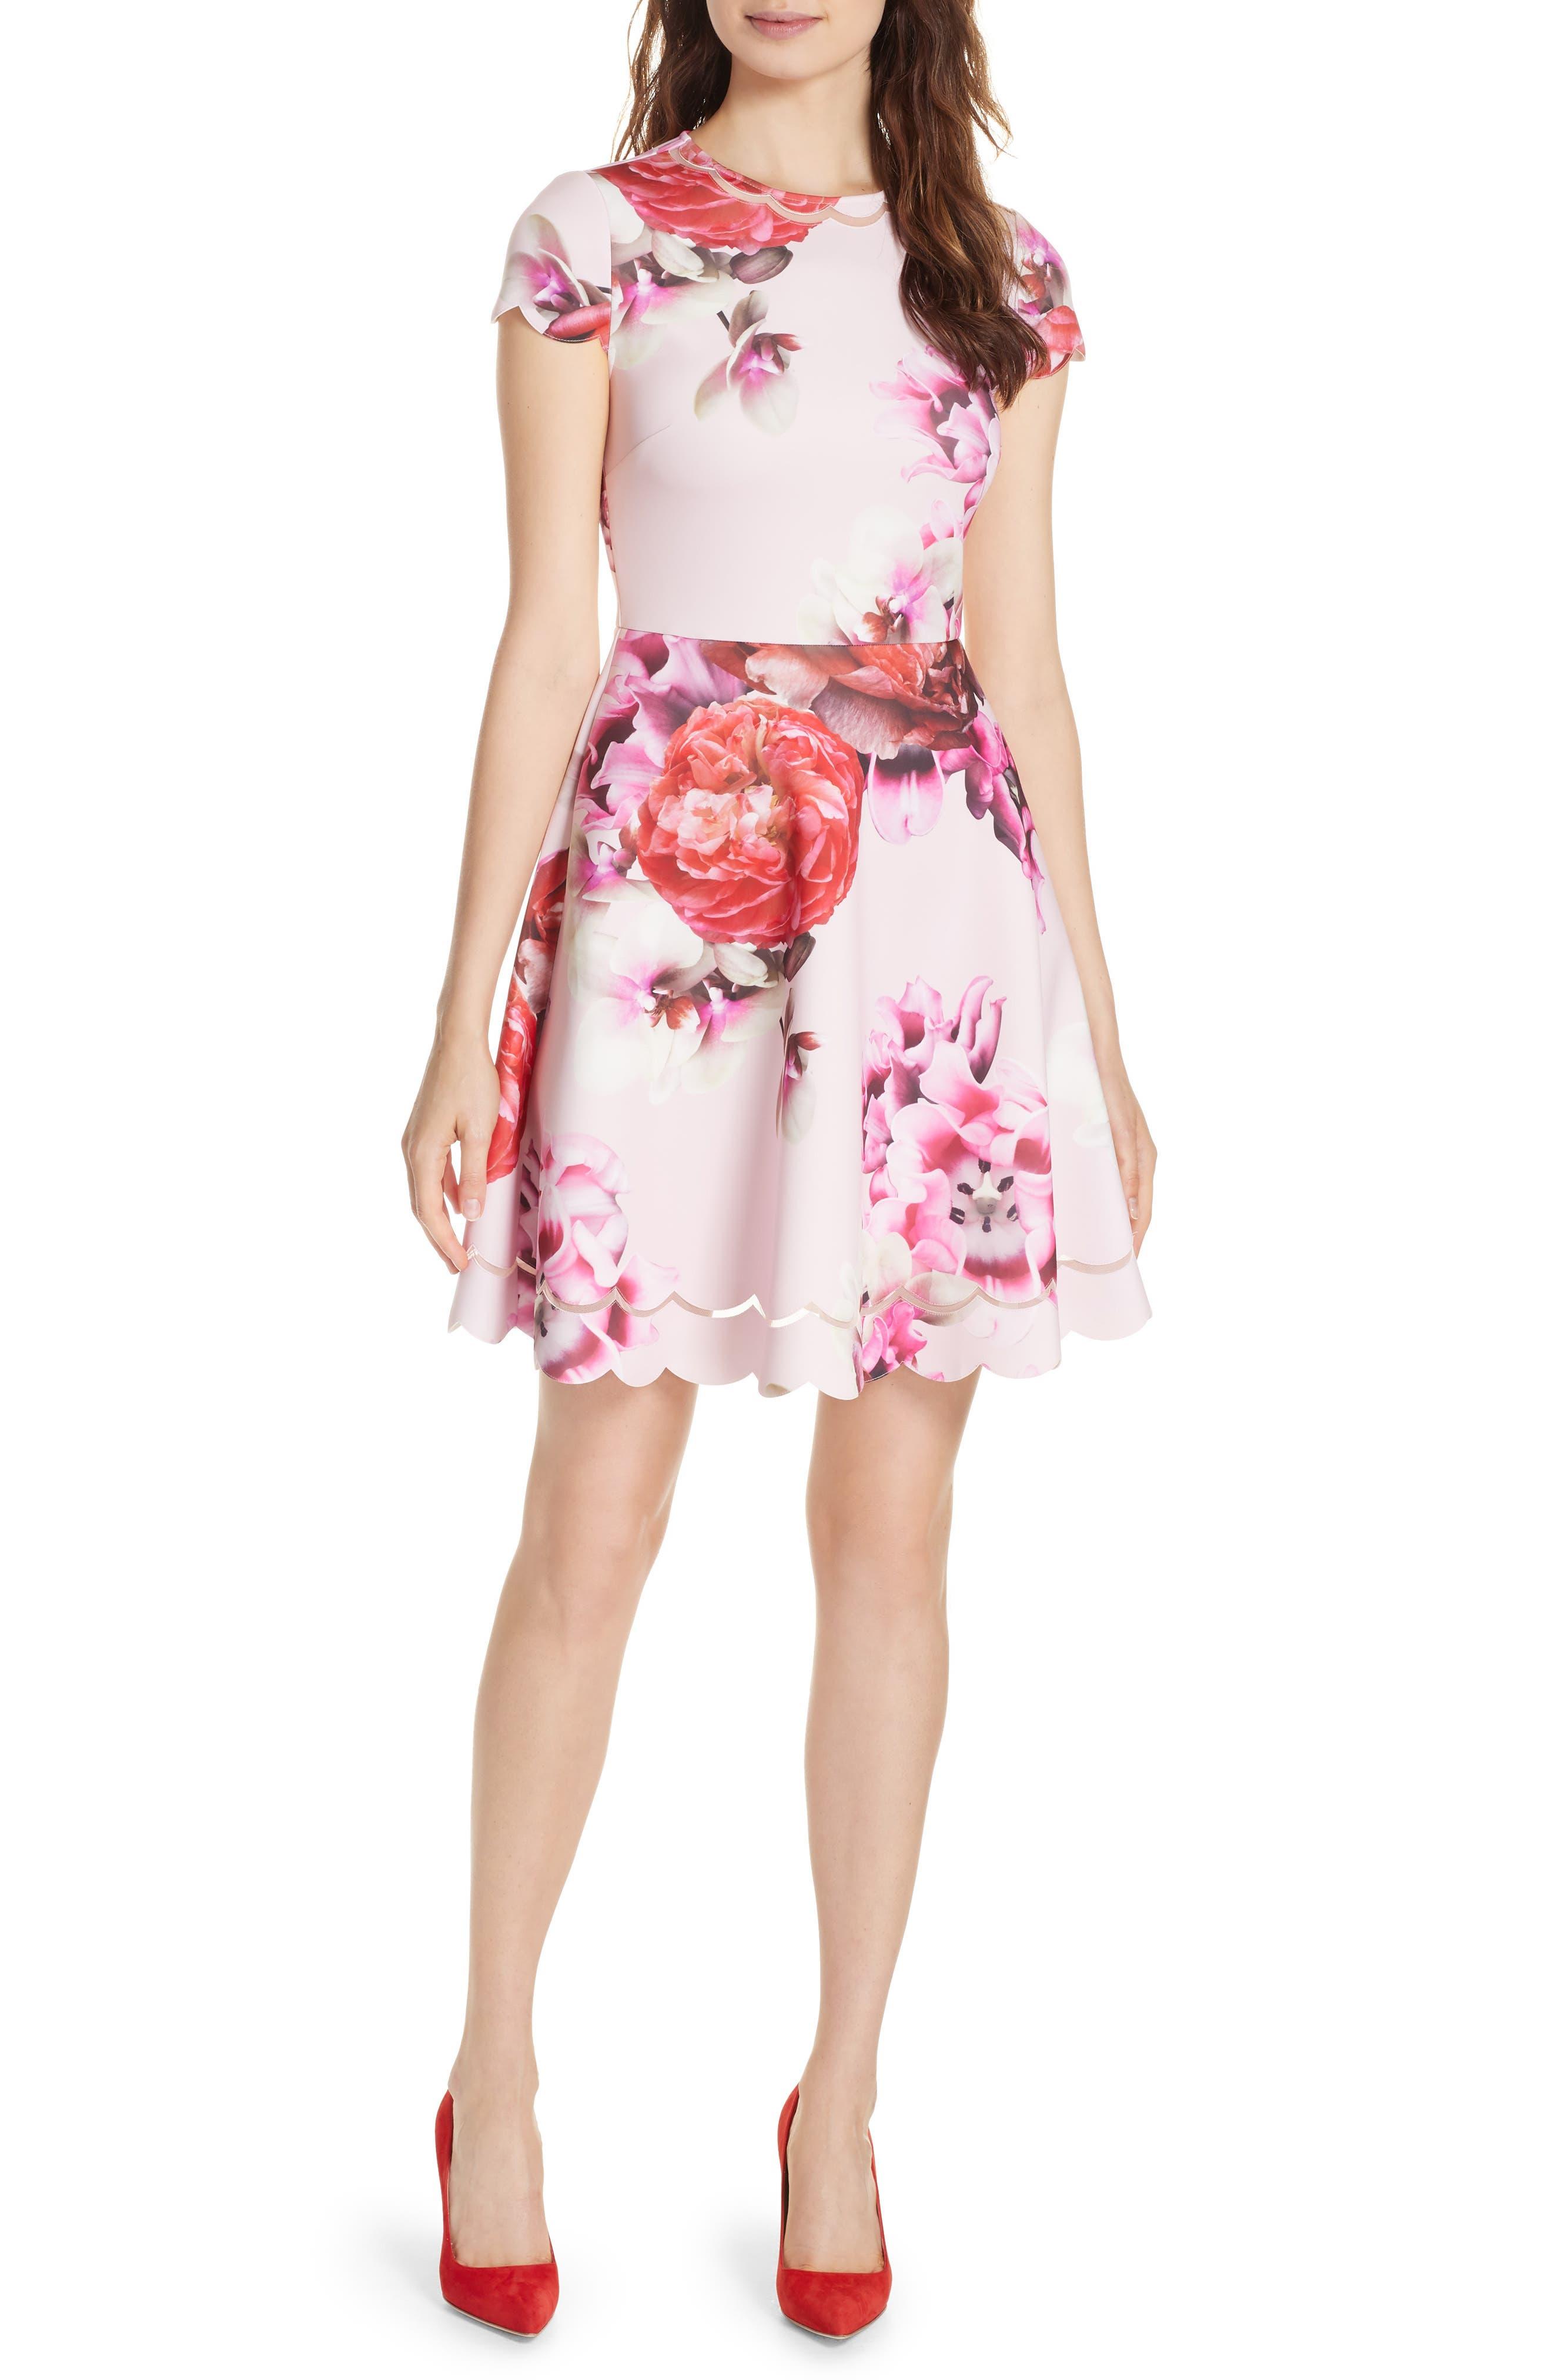 Seeana Splendour Skater Dress,                             Main thumbnail 1, color,                             683